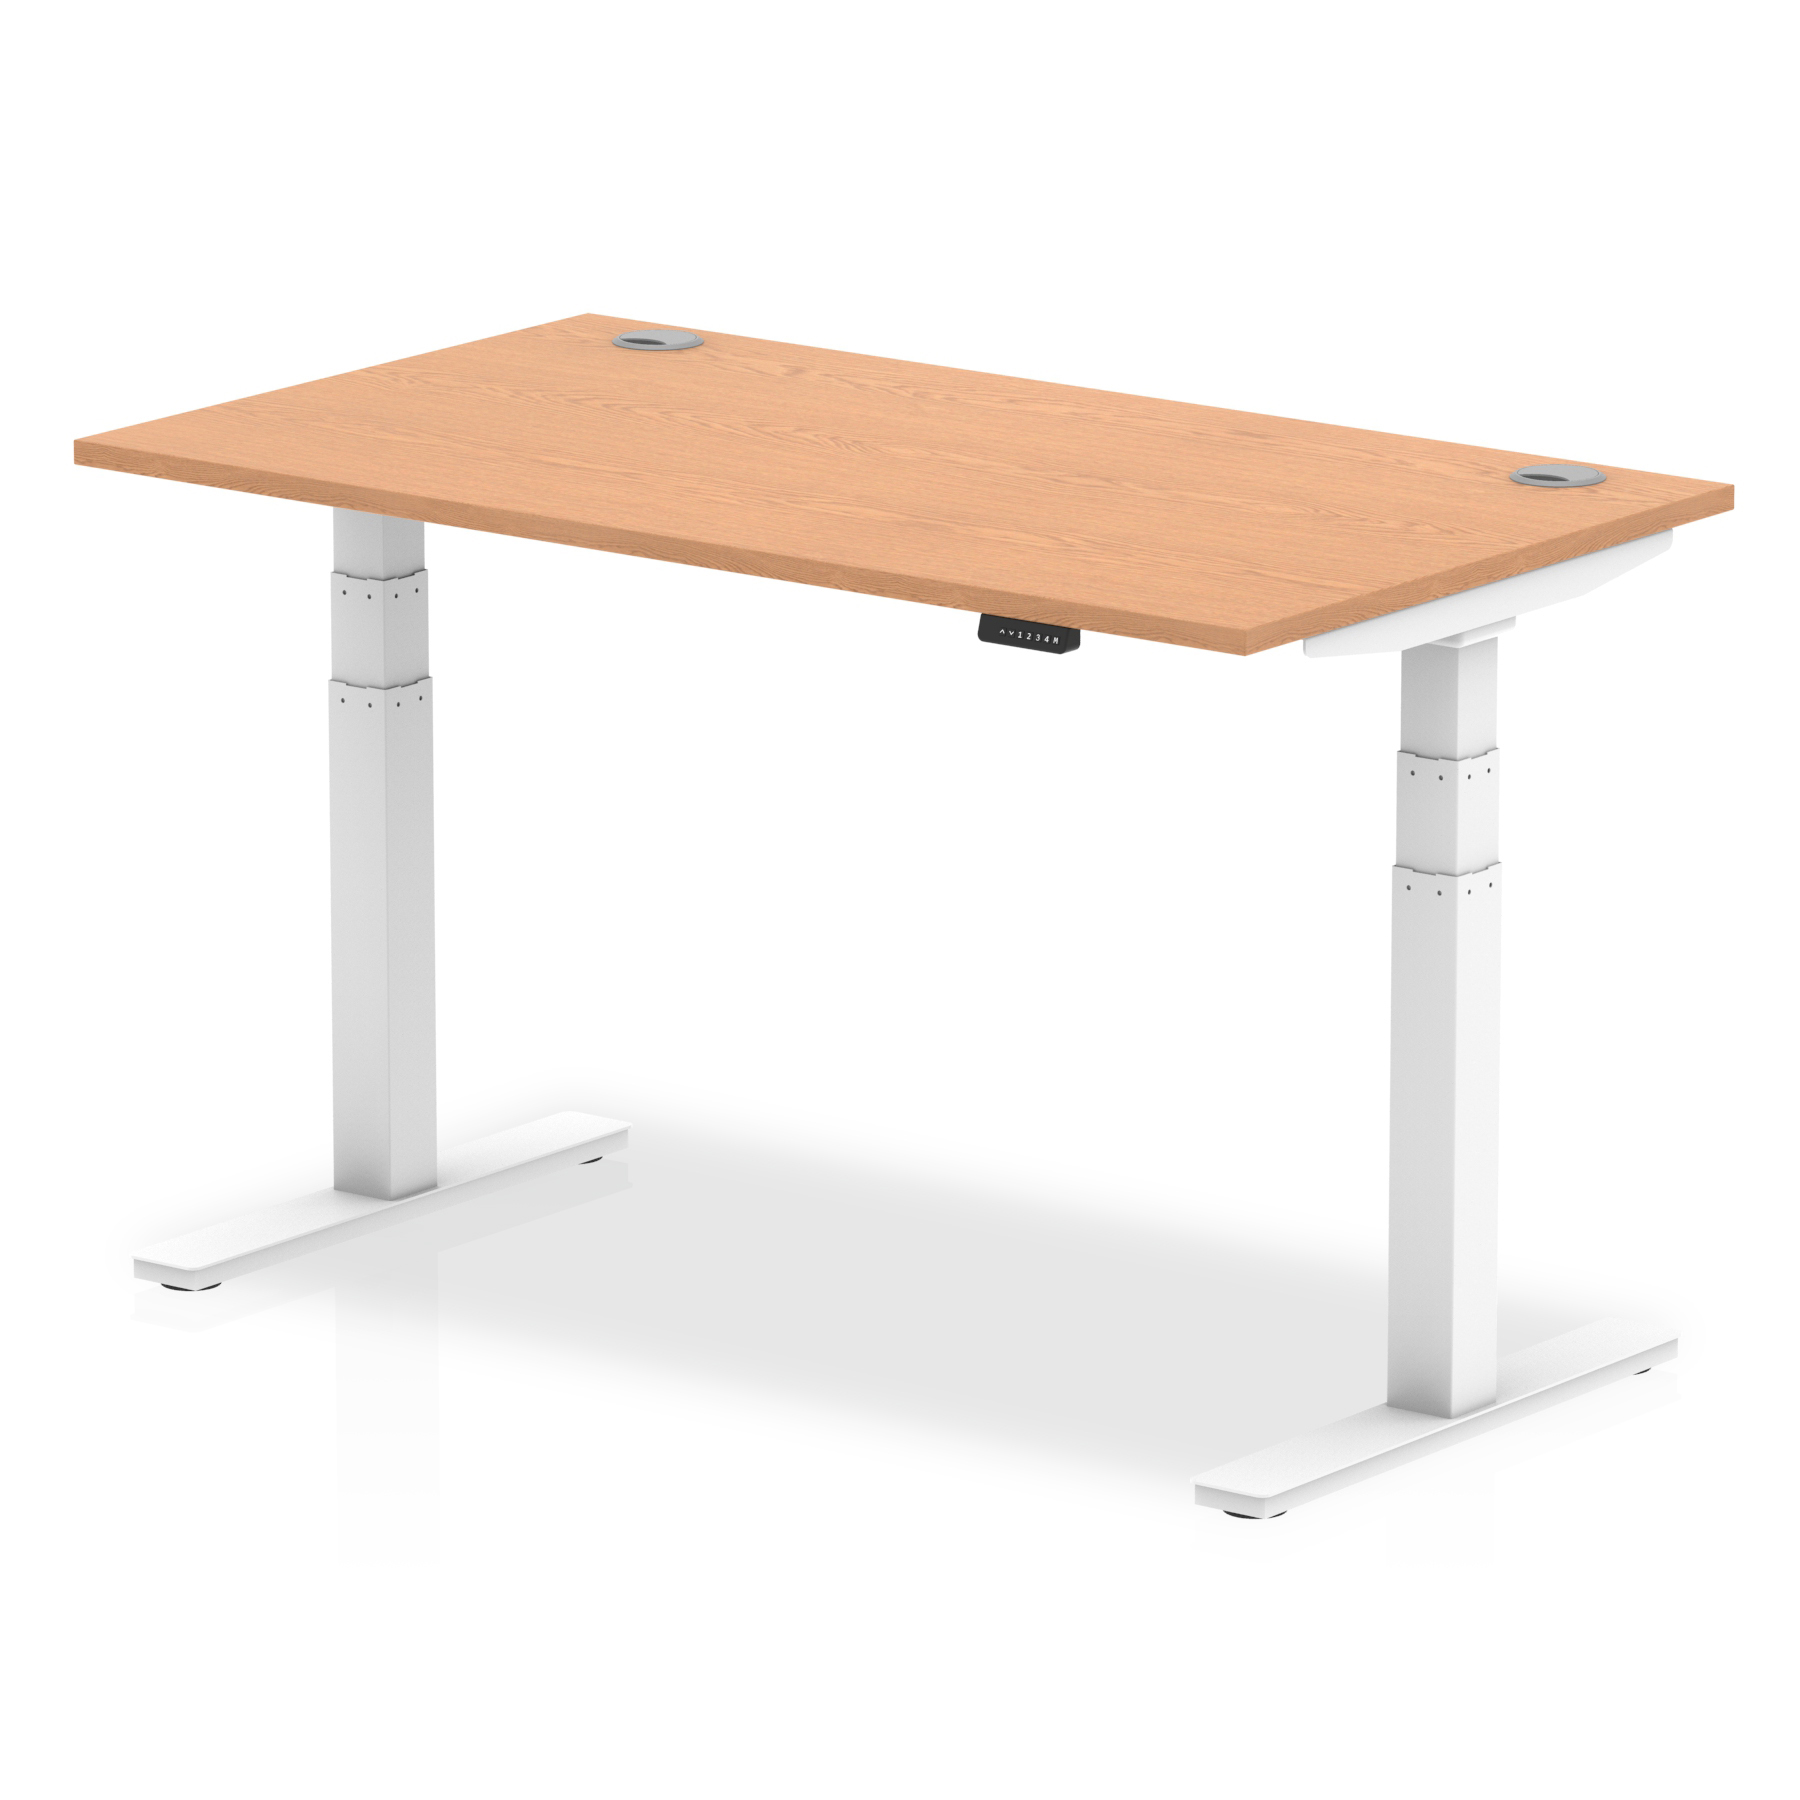 Trexus Sit Stand Desk With Cable Ports White Legs 1400x800mm Oak Ref HA01118